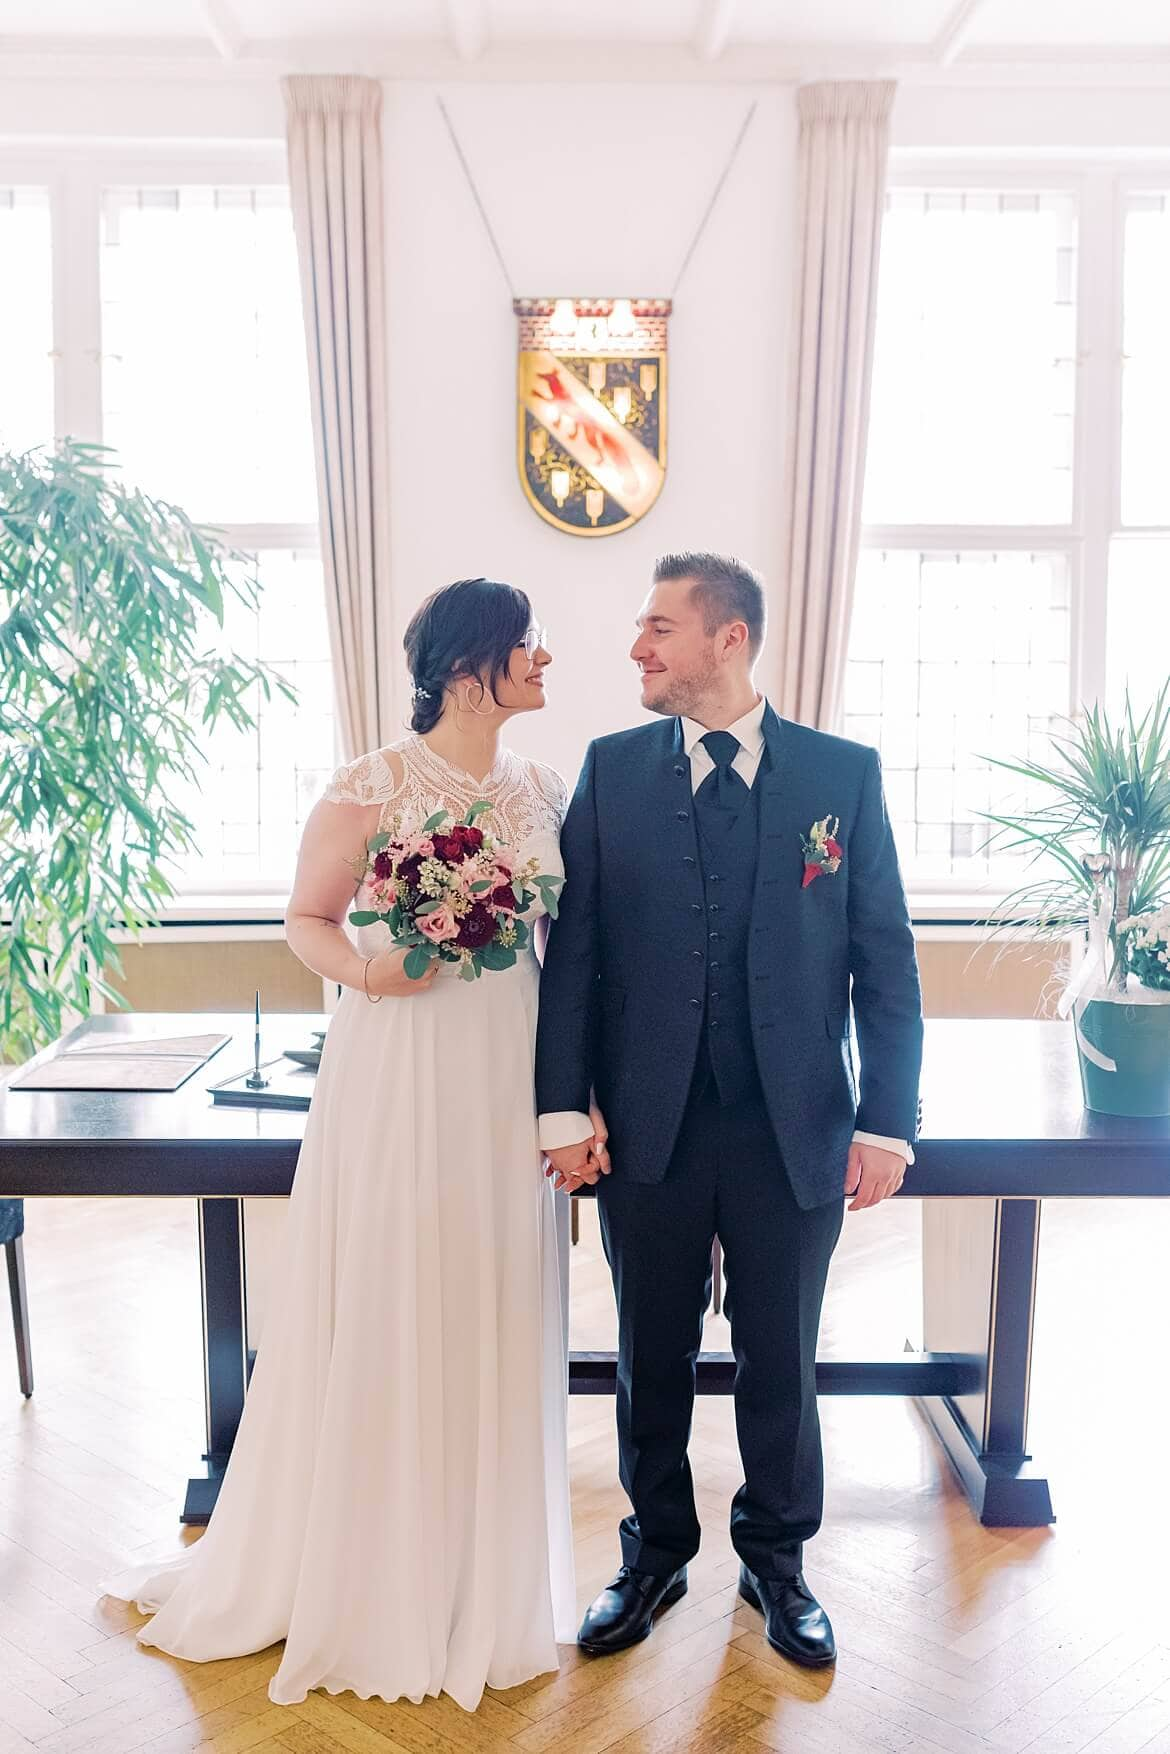 Brautpaar im Standesamt Berlin Reinickendorf